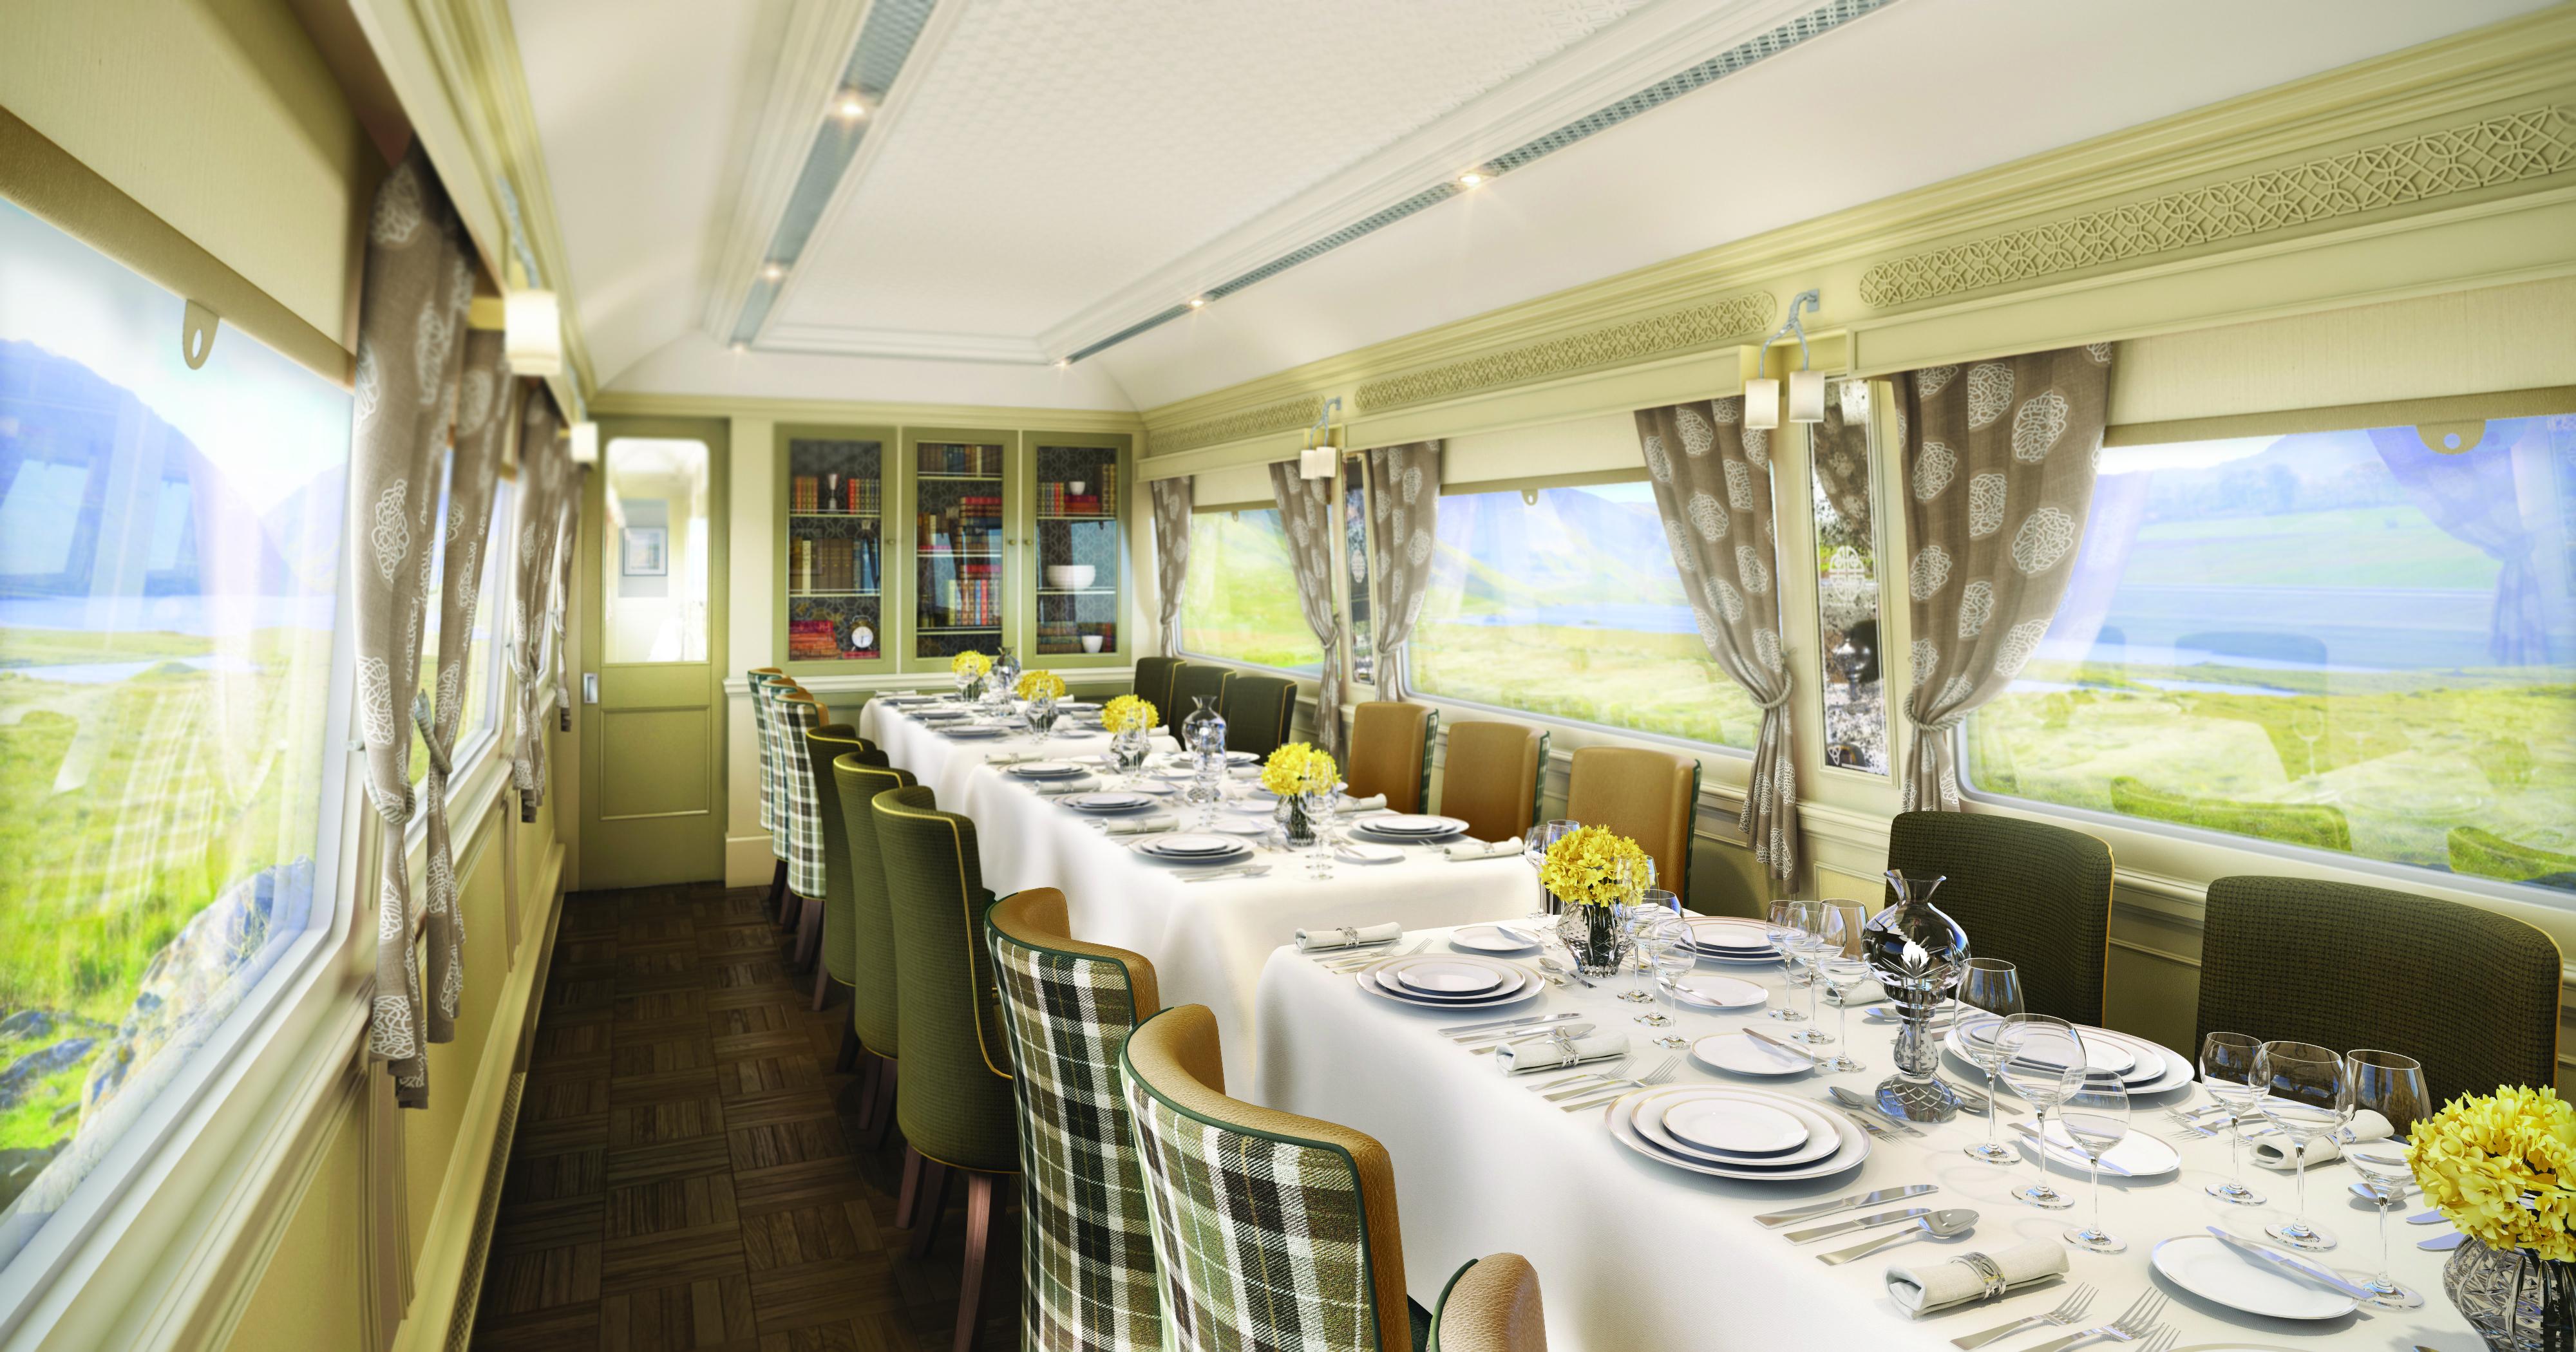 Full steam ahead: All aboard the Belmond Grand Hibernian